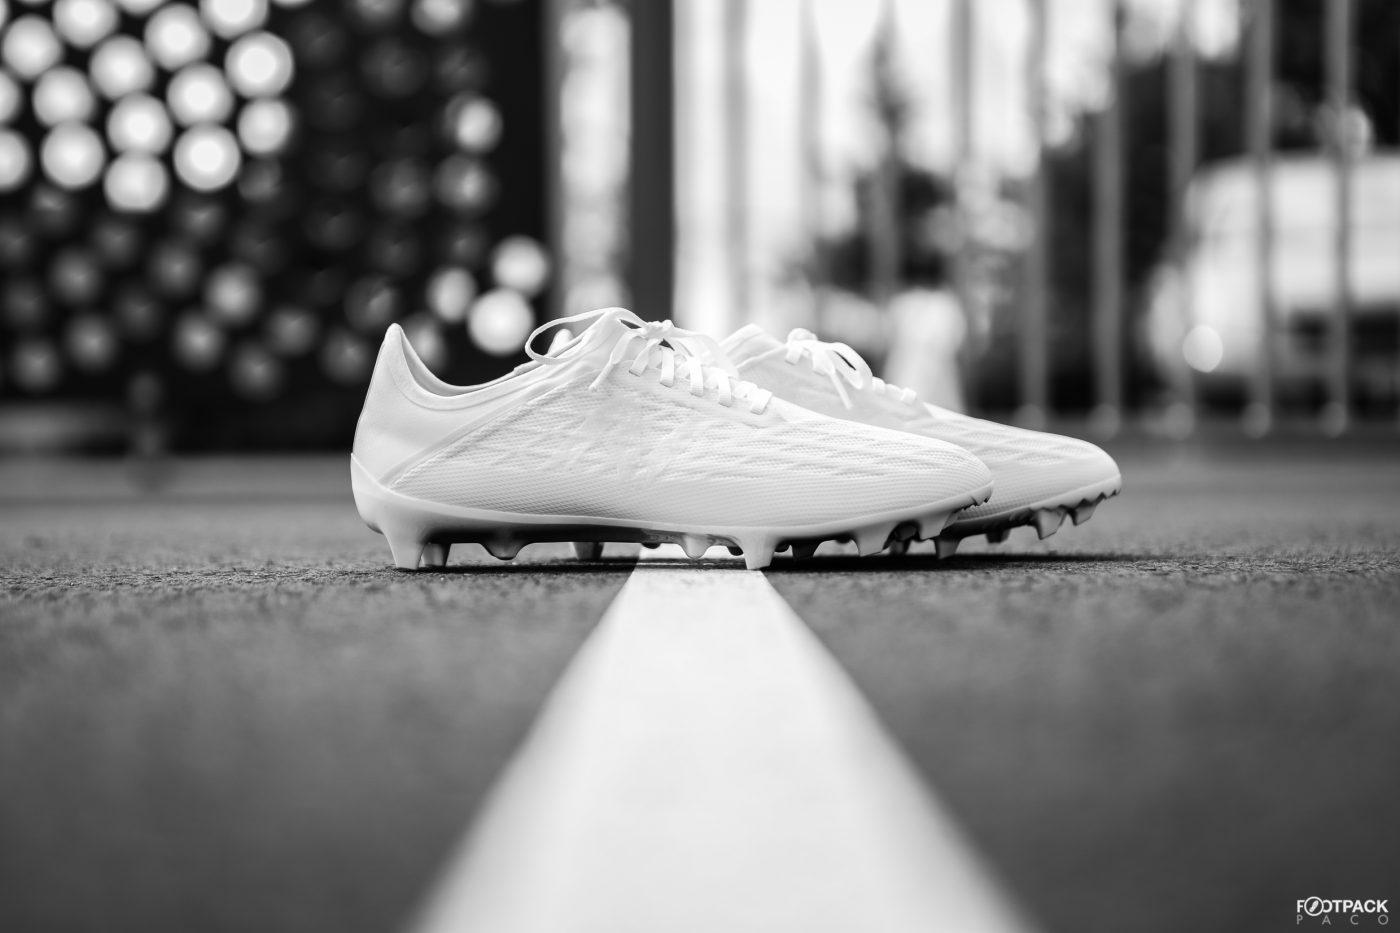 chaussures-football-new-balance-infinite-lite-pac-furon-tekela-9